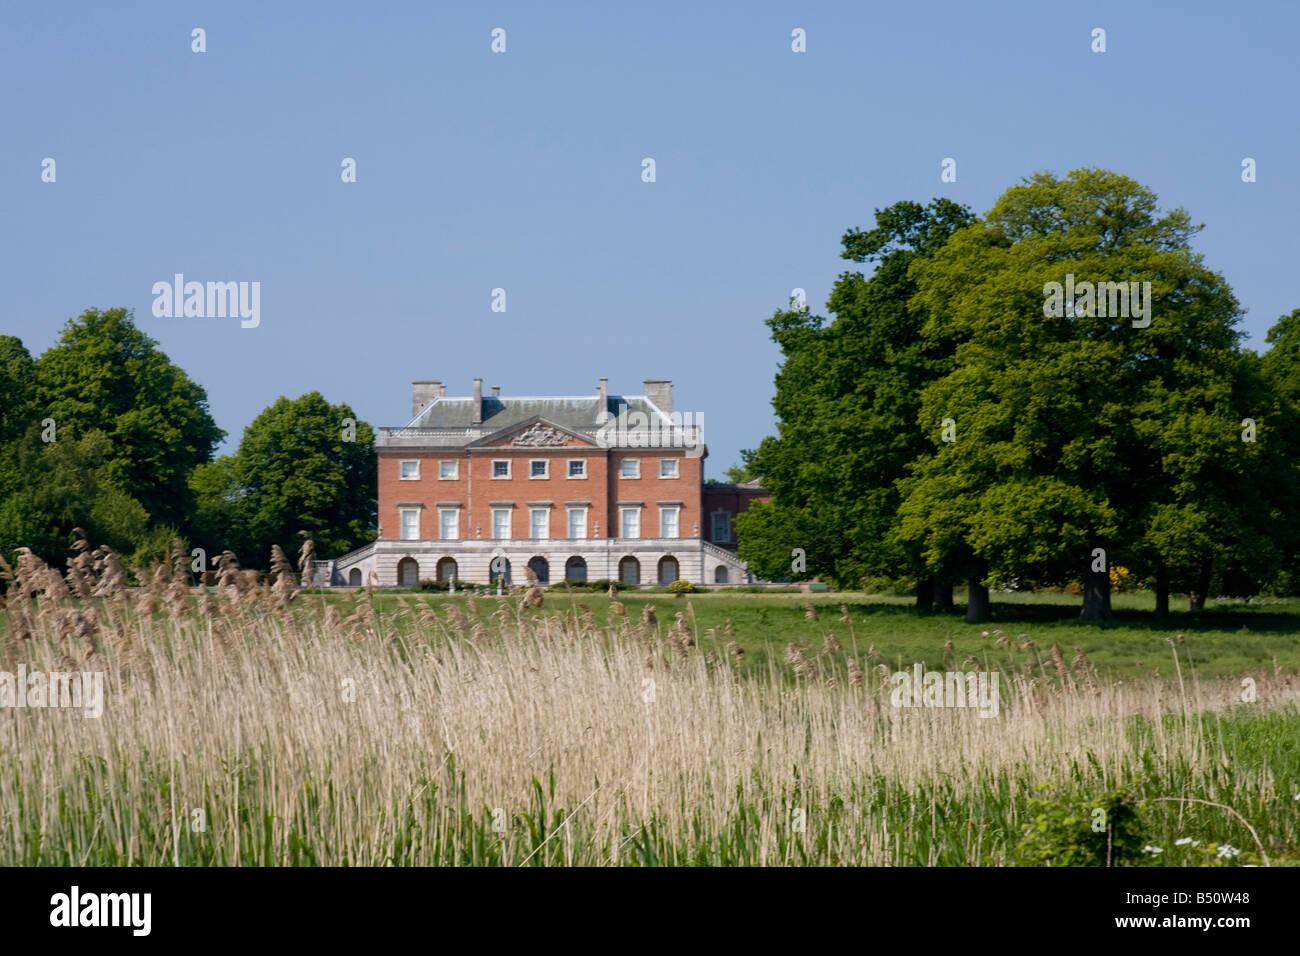 Wolterton Hall cerca de Aylsham, Norfolk, Inglaterra Imagen De Stock